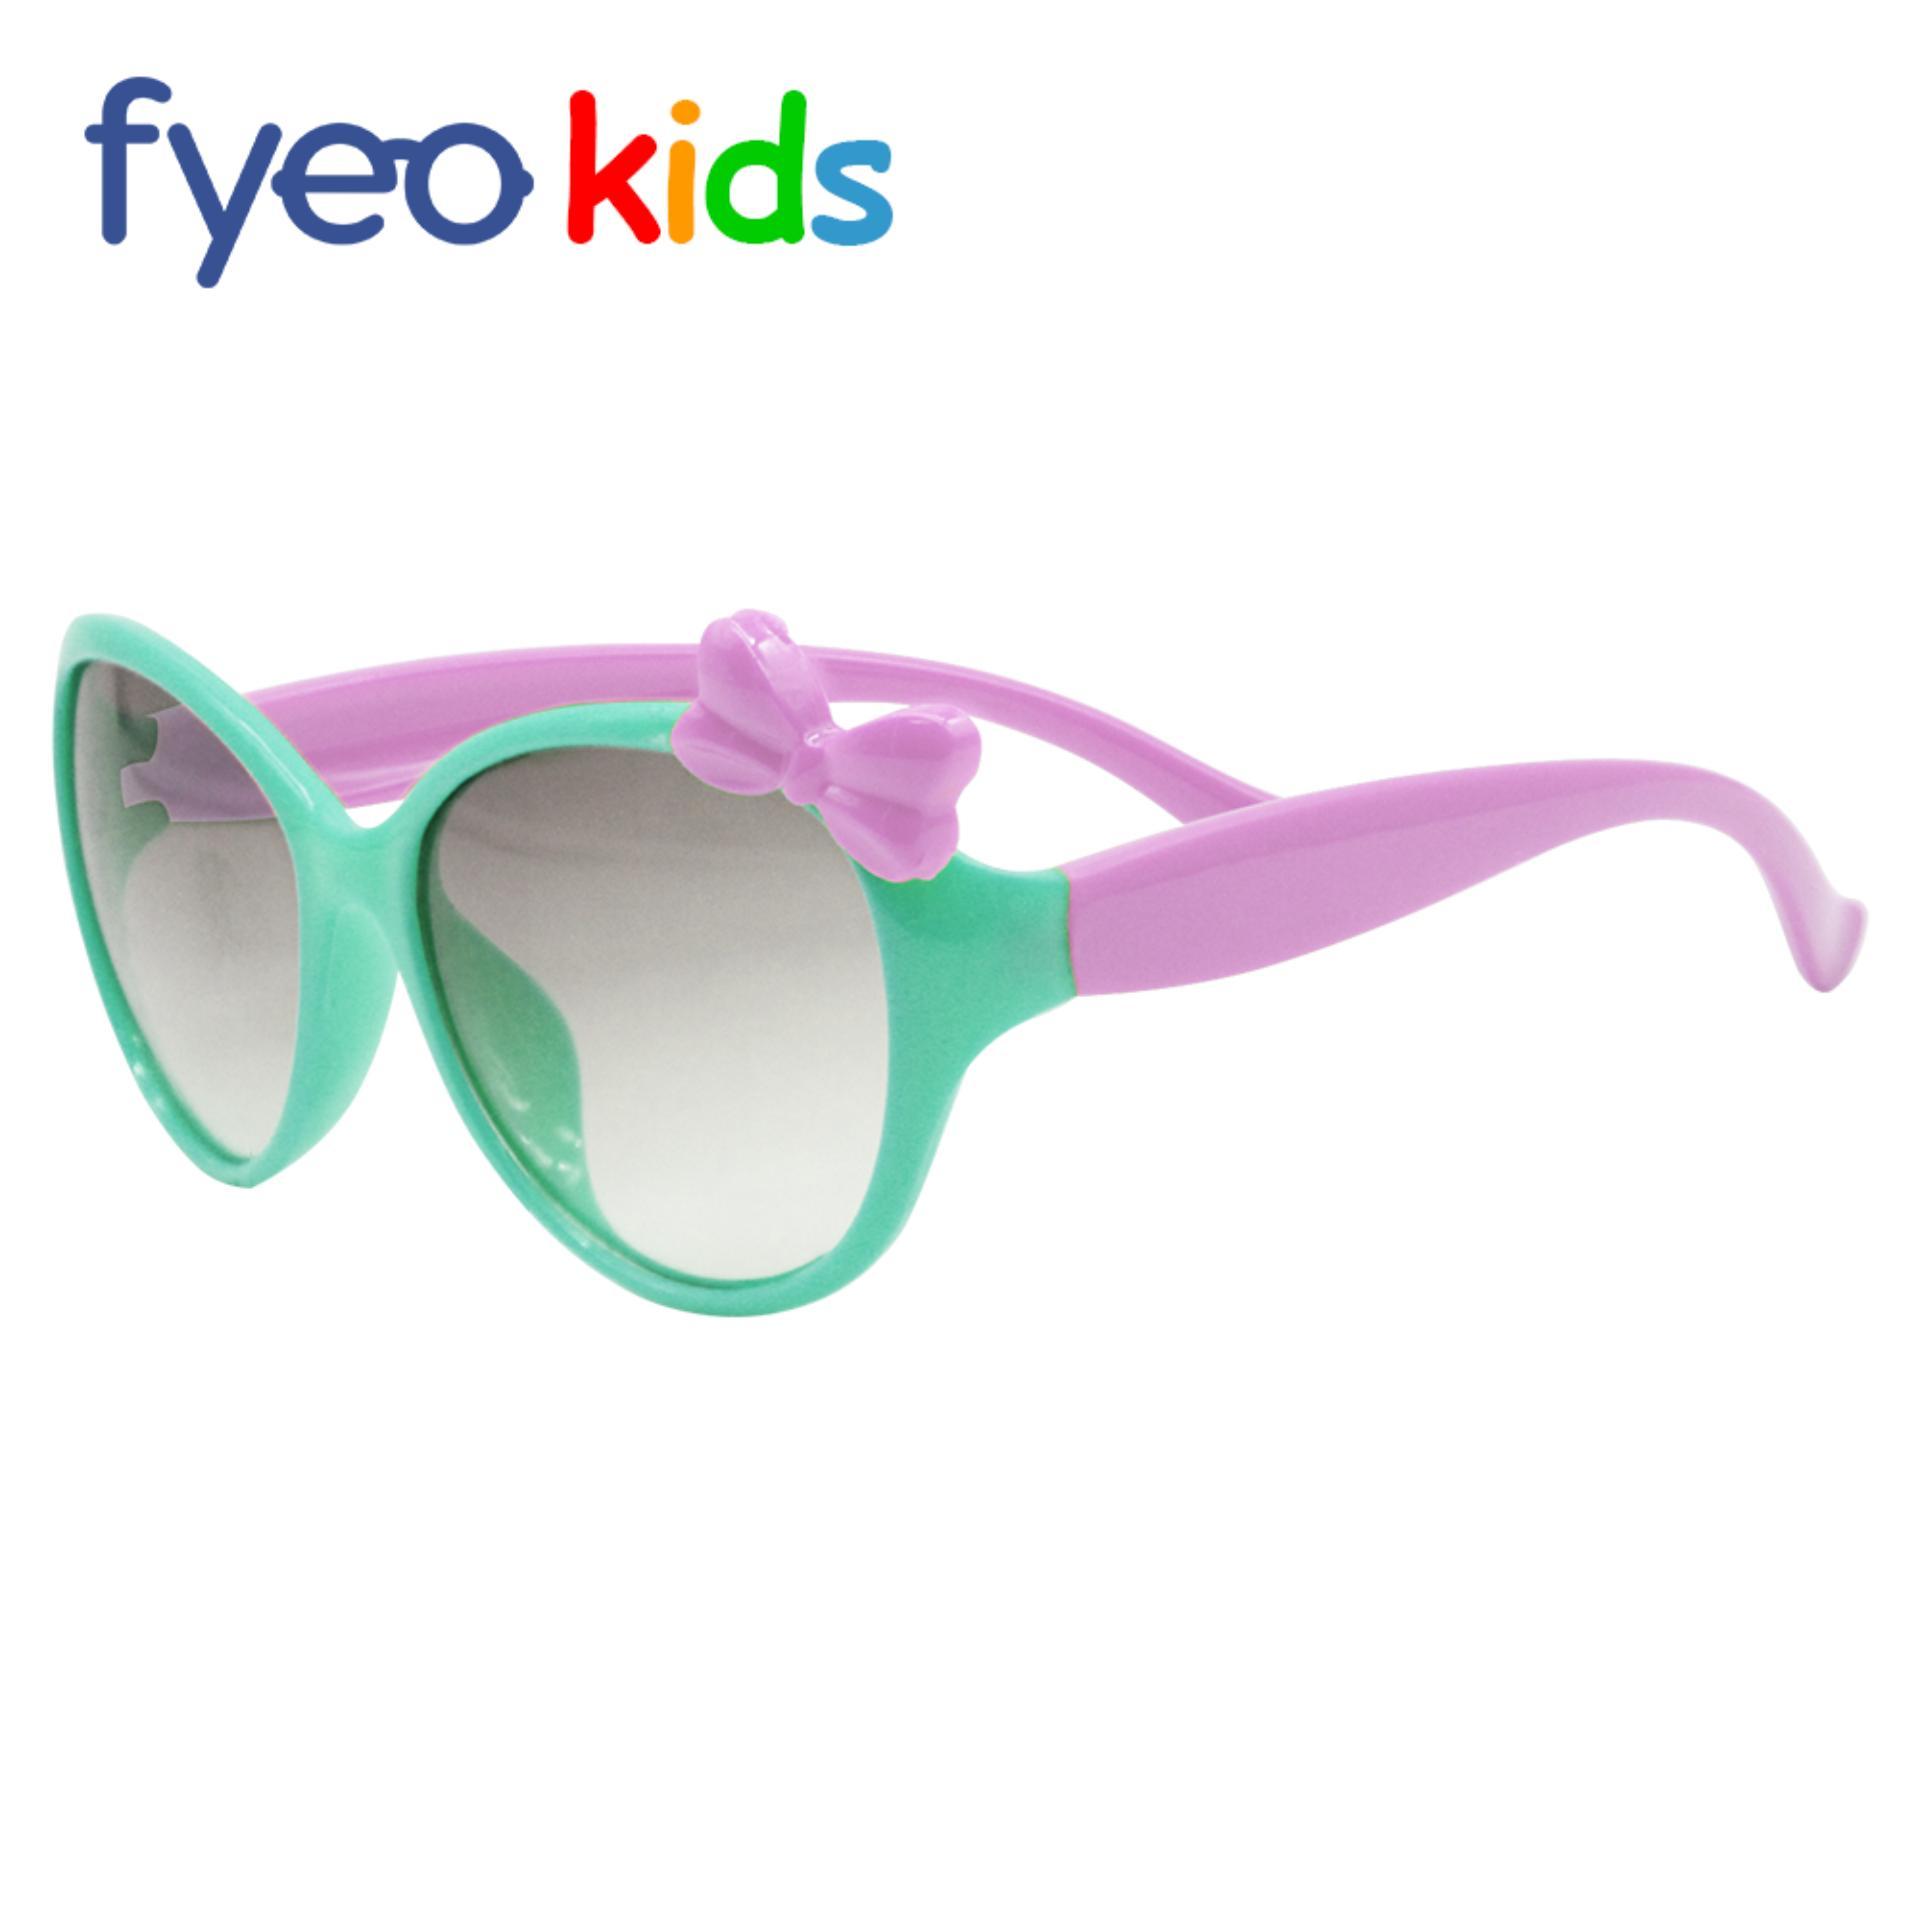 672e451bc007 Anti-UV Sunglasses for Kids Girls Ribbon Fashion Sunglasses Frame:Teal  Leg:Pink